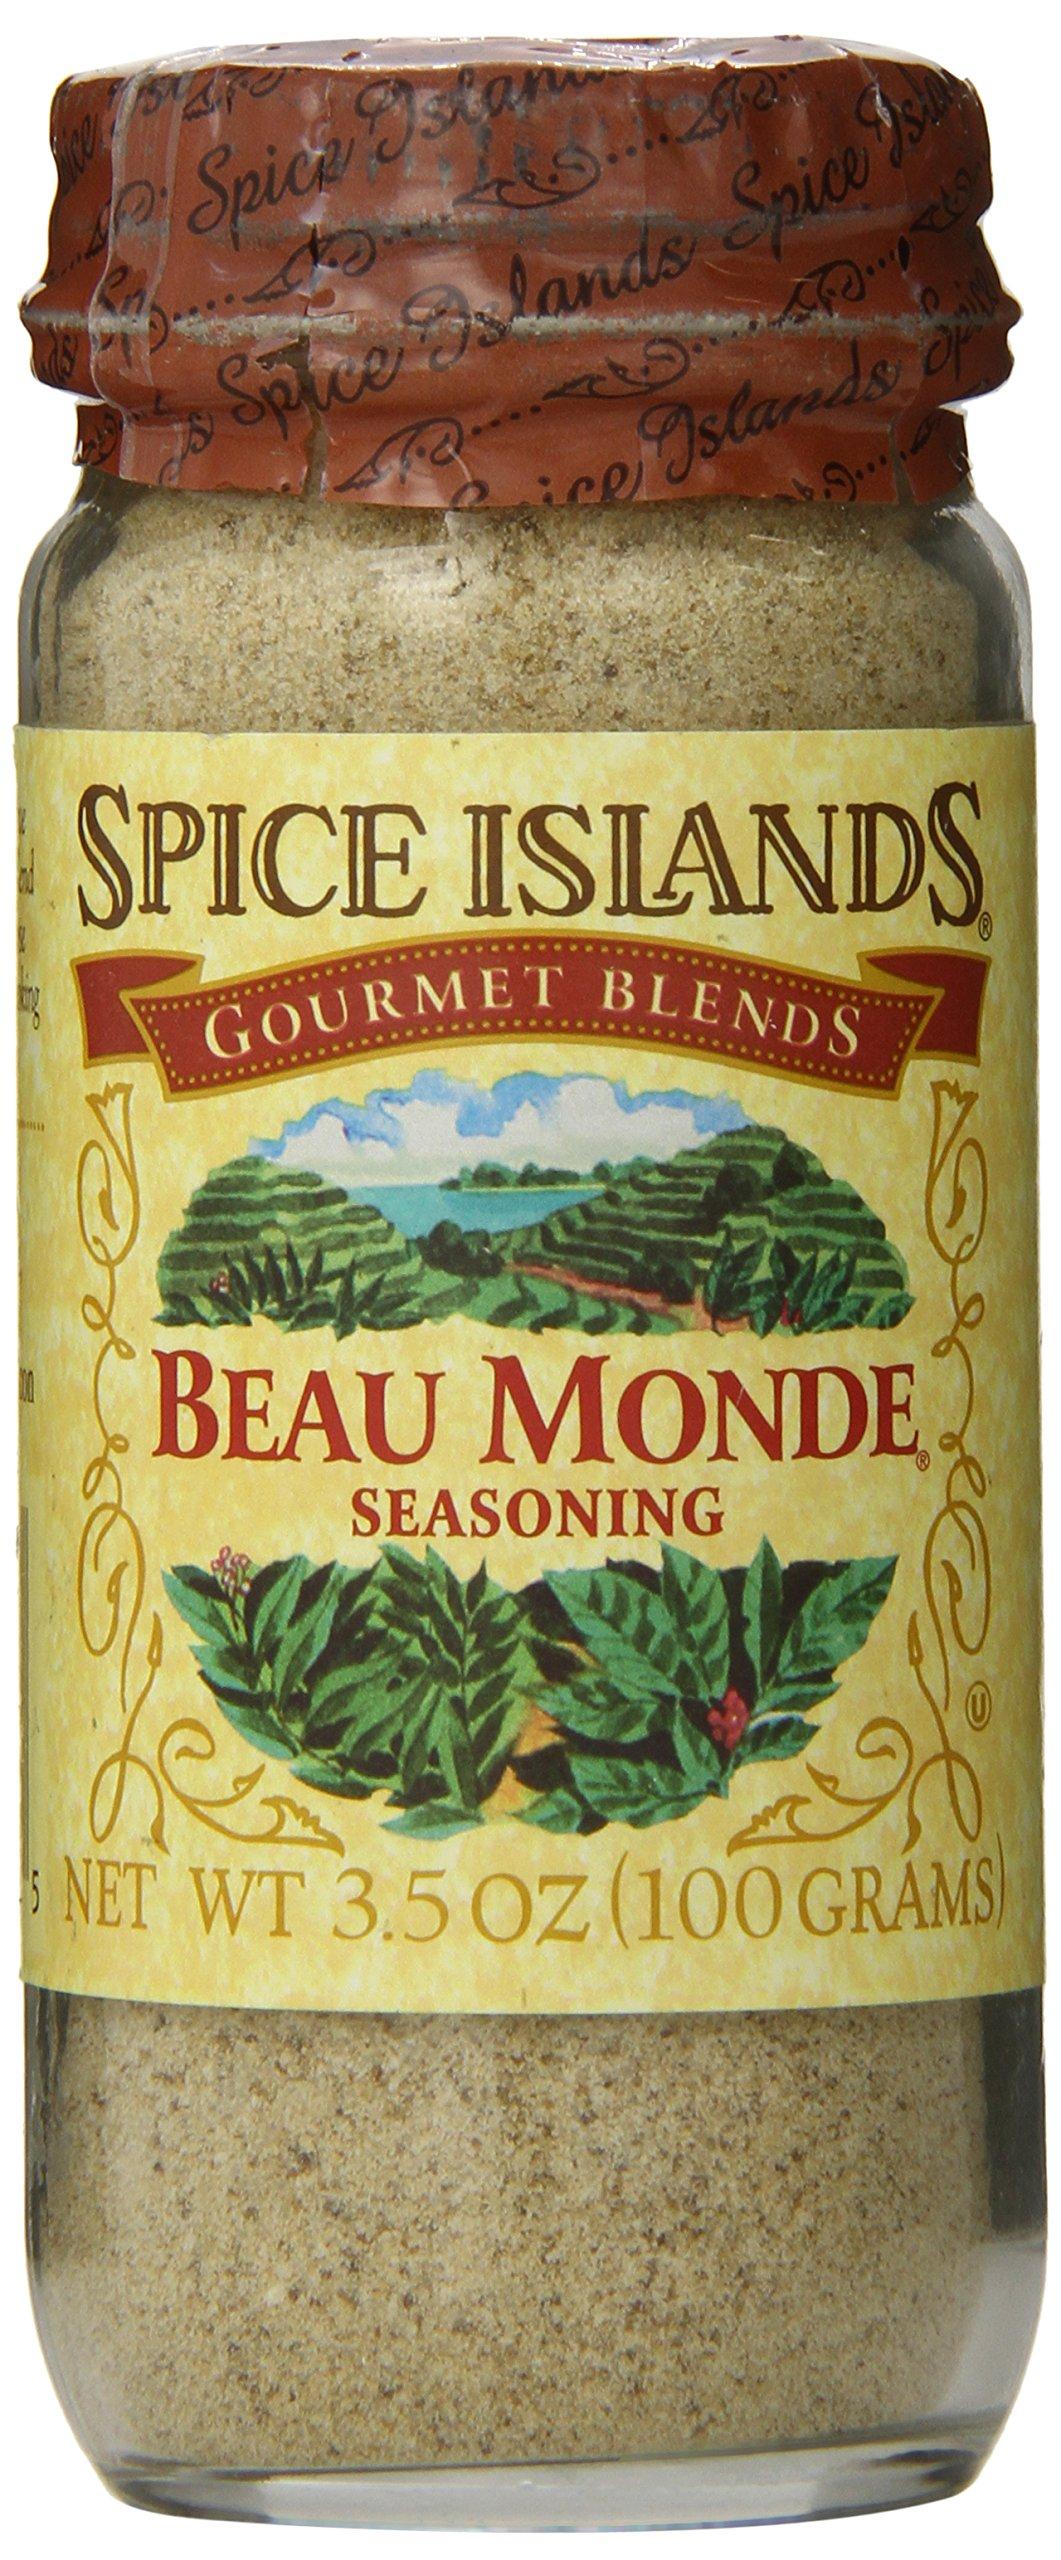 Spice Island Beau Monde Seasoning, 3.5 oz 81DSd6VmScL